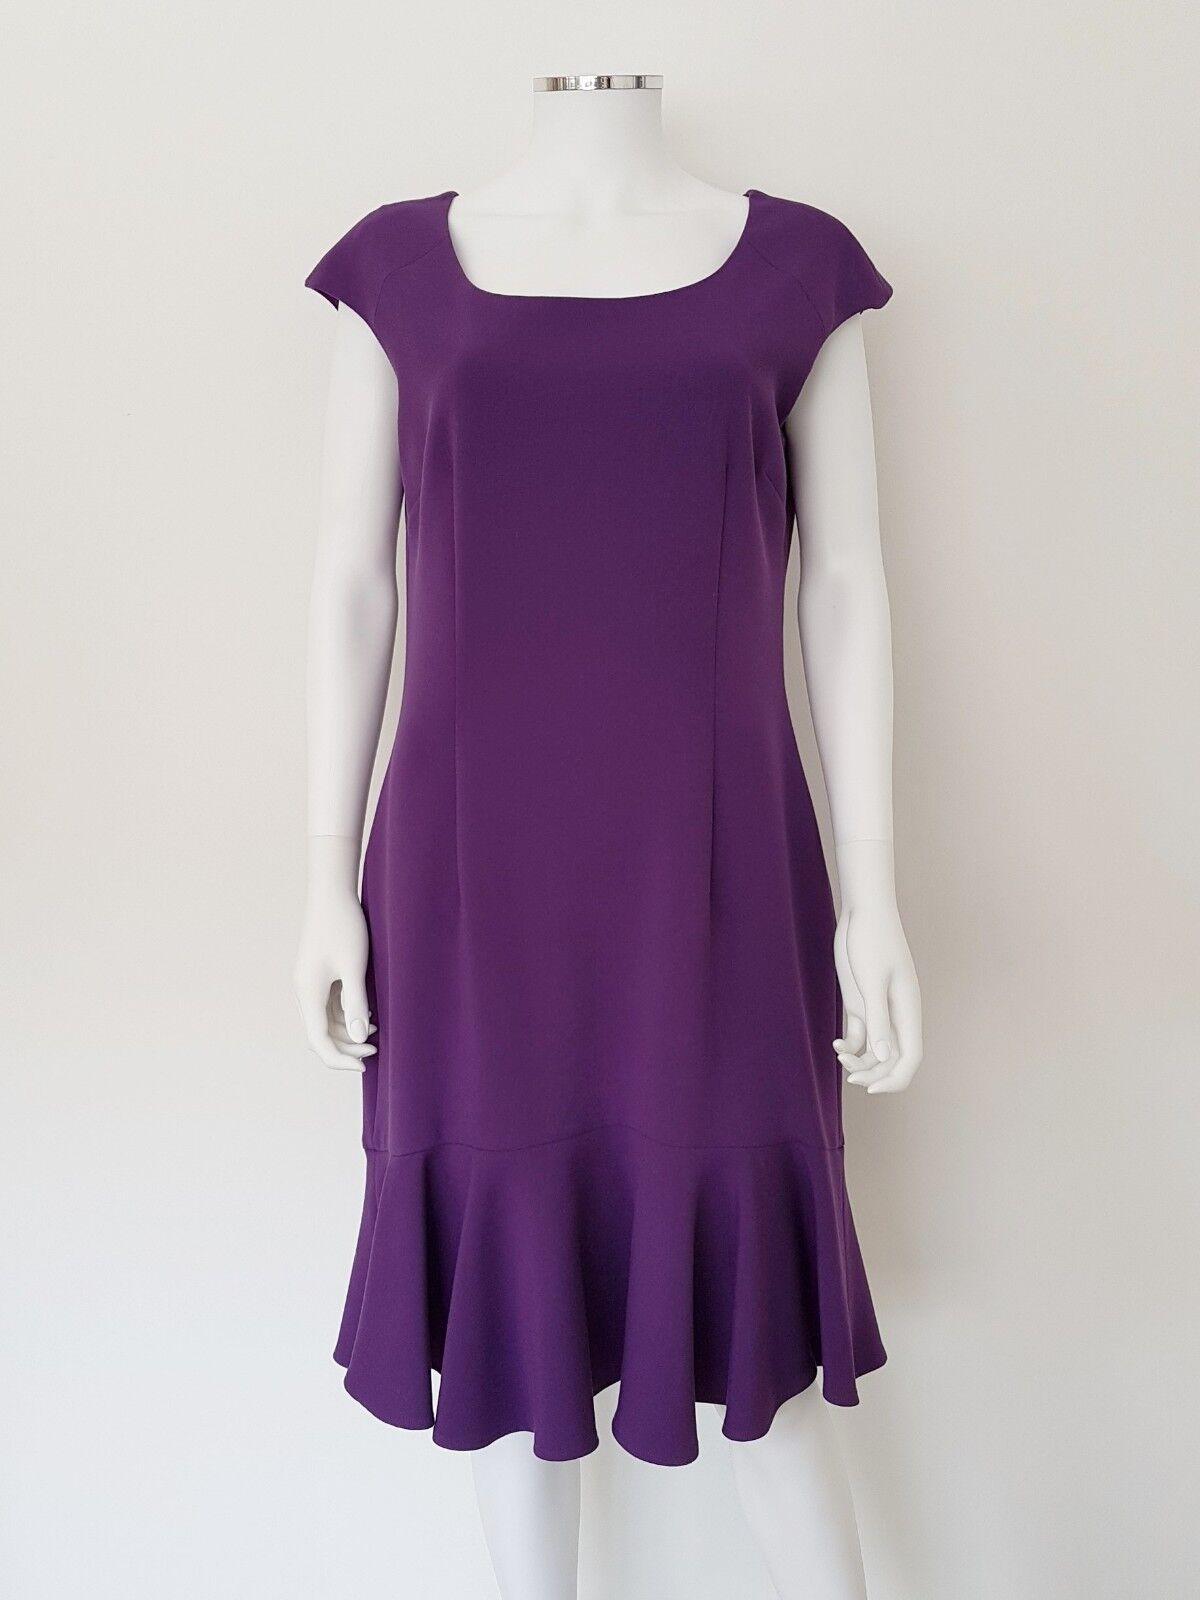 14 16 JAEGER lila Peplum Hem Dress with Cap Sleeve & Stretch Comfort   Wedding